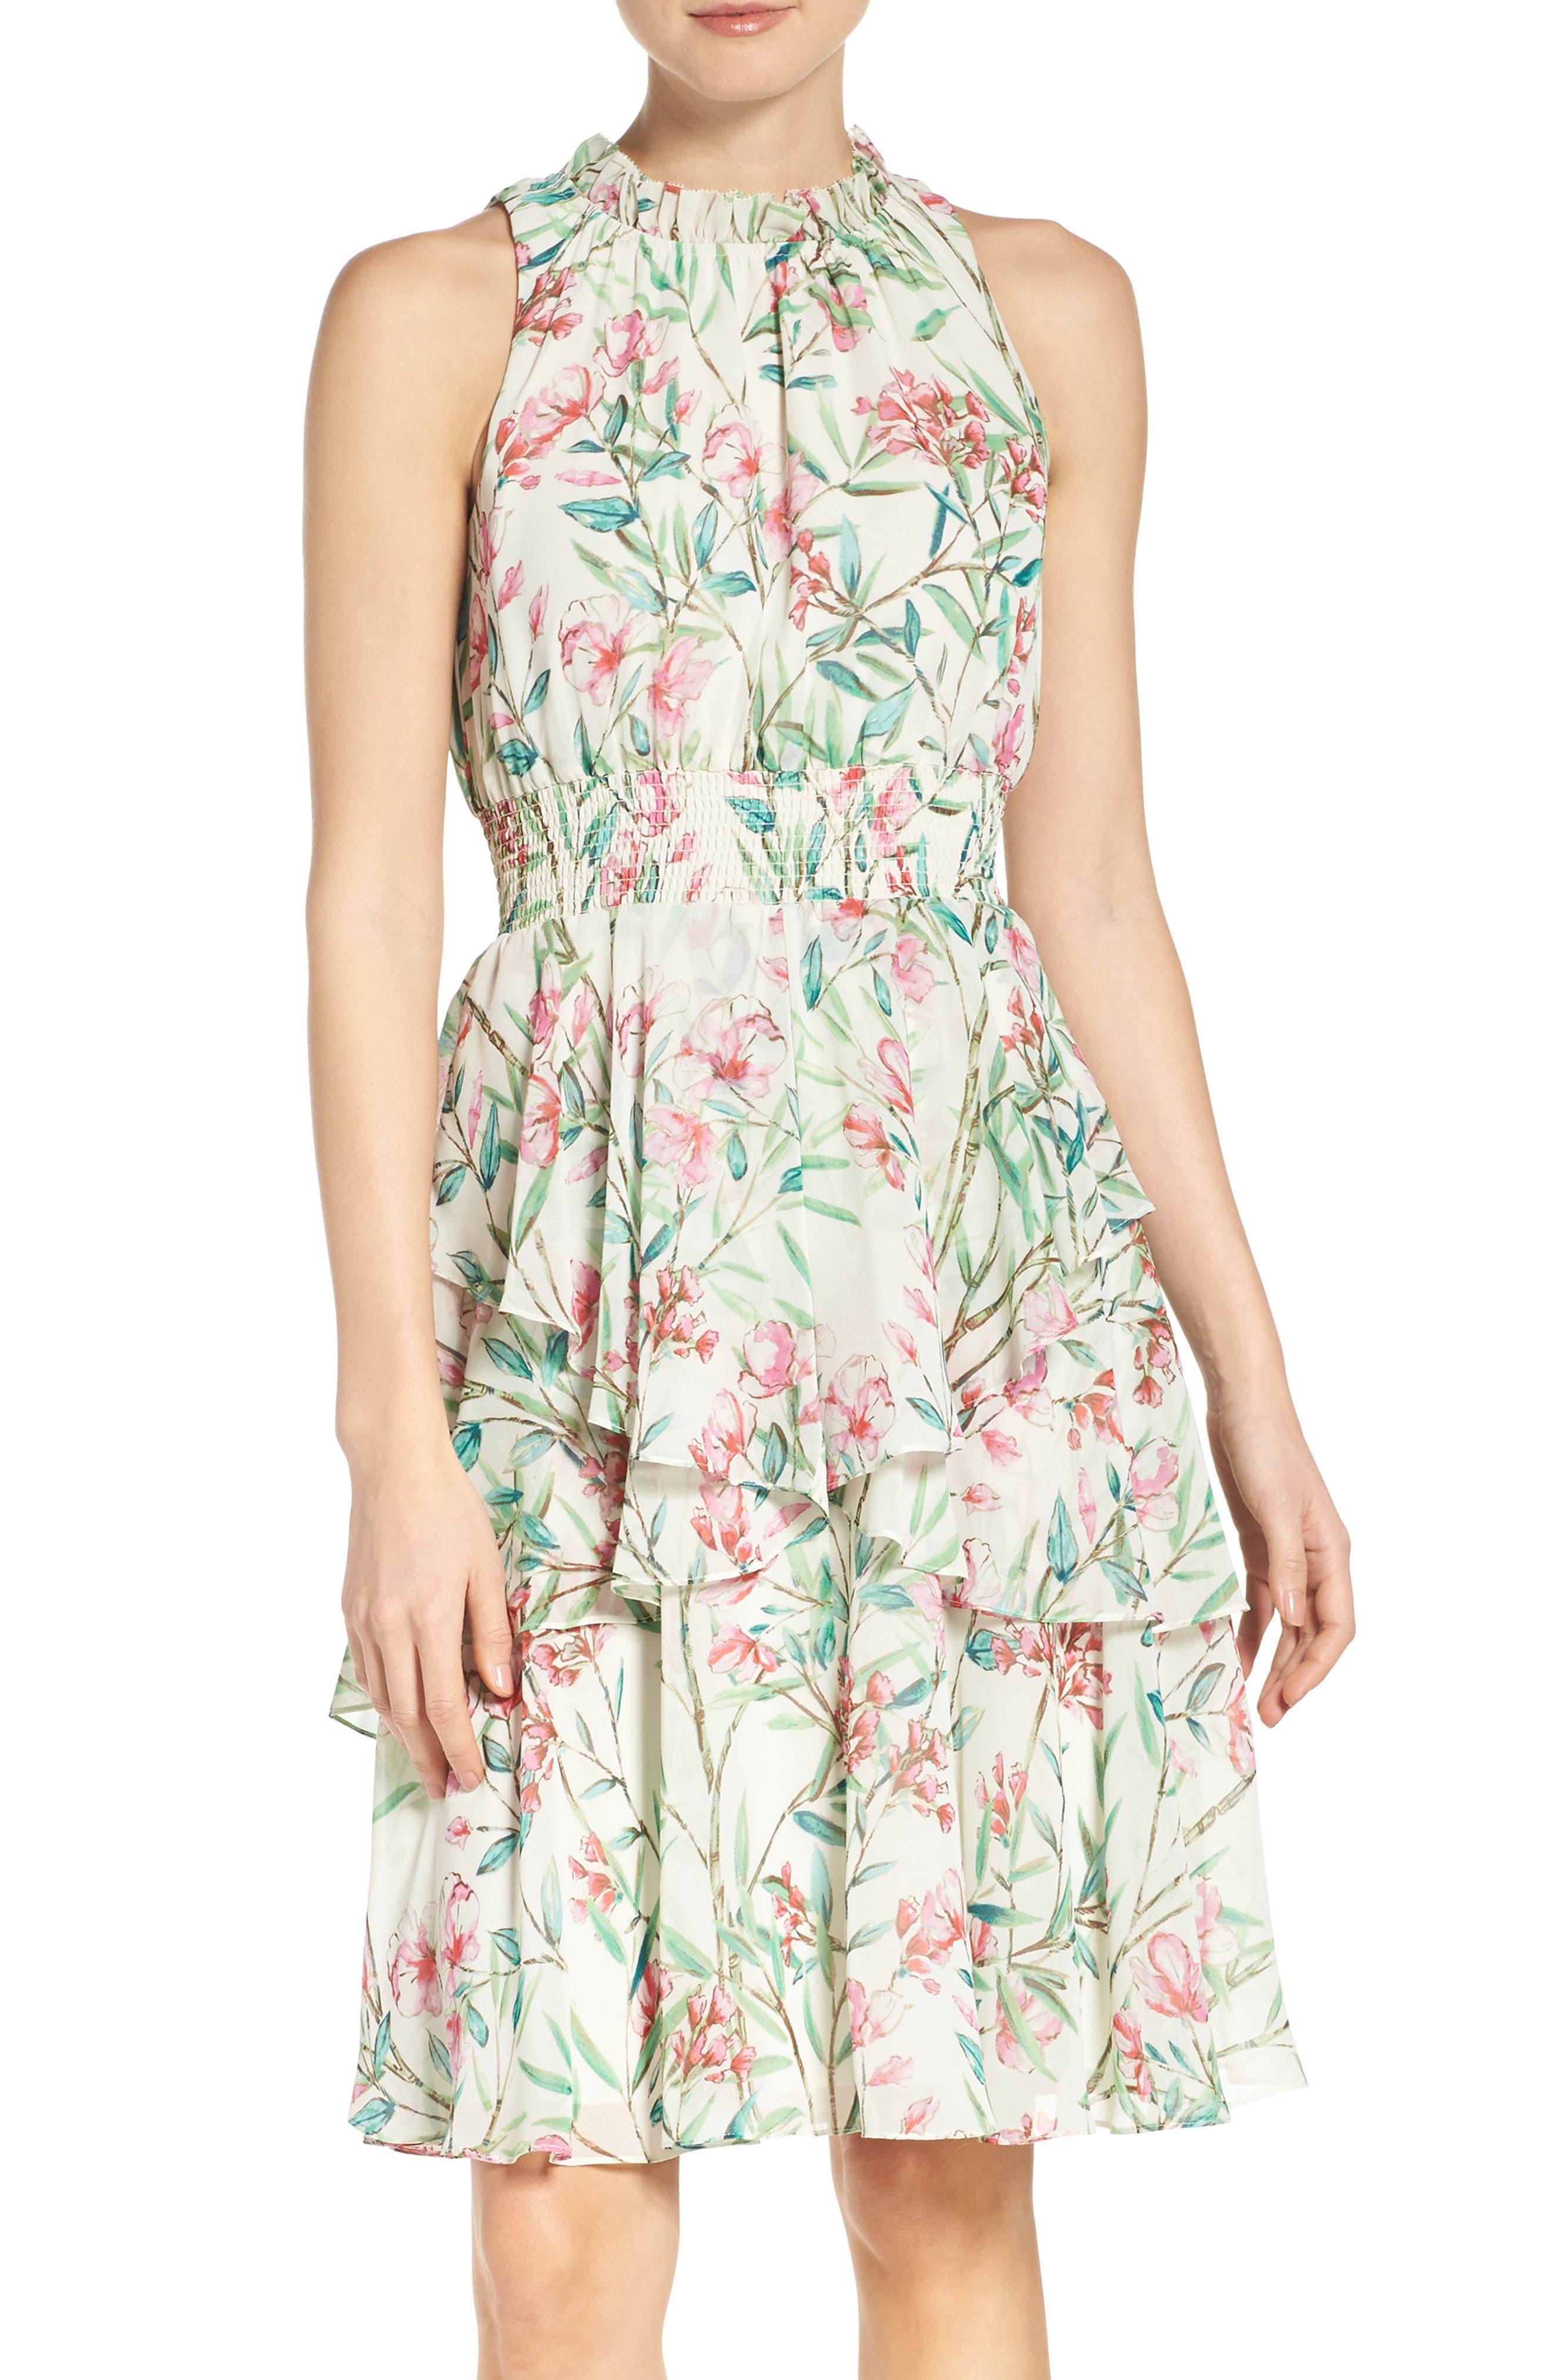 ELIZA J, Chiffon Fit & Flare Dress, Main thumbnail 1, color, 901